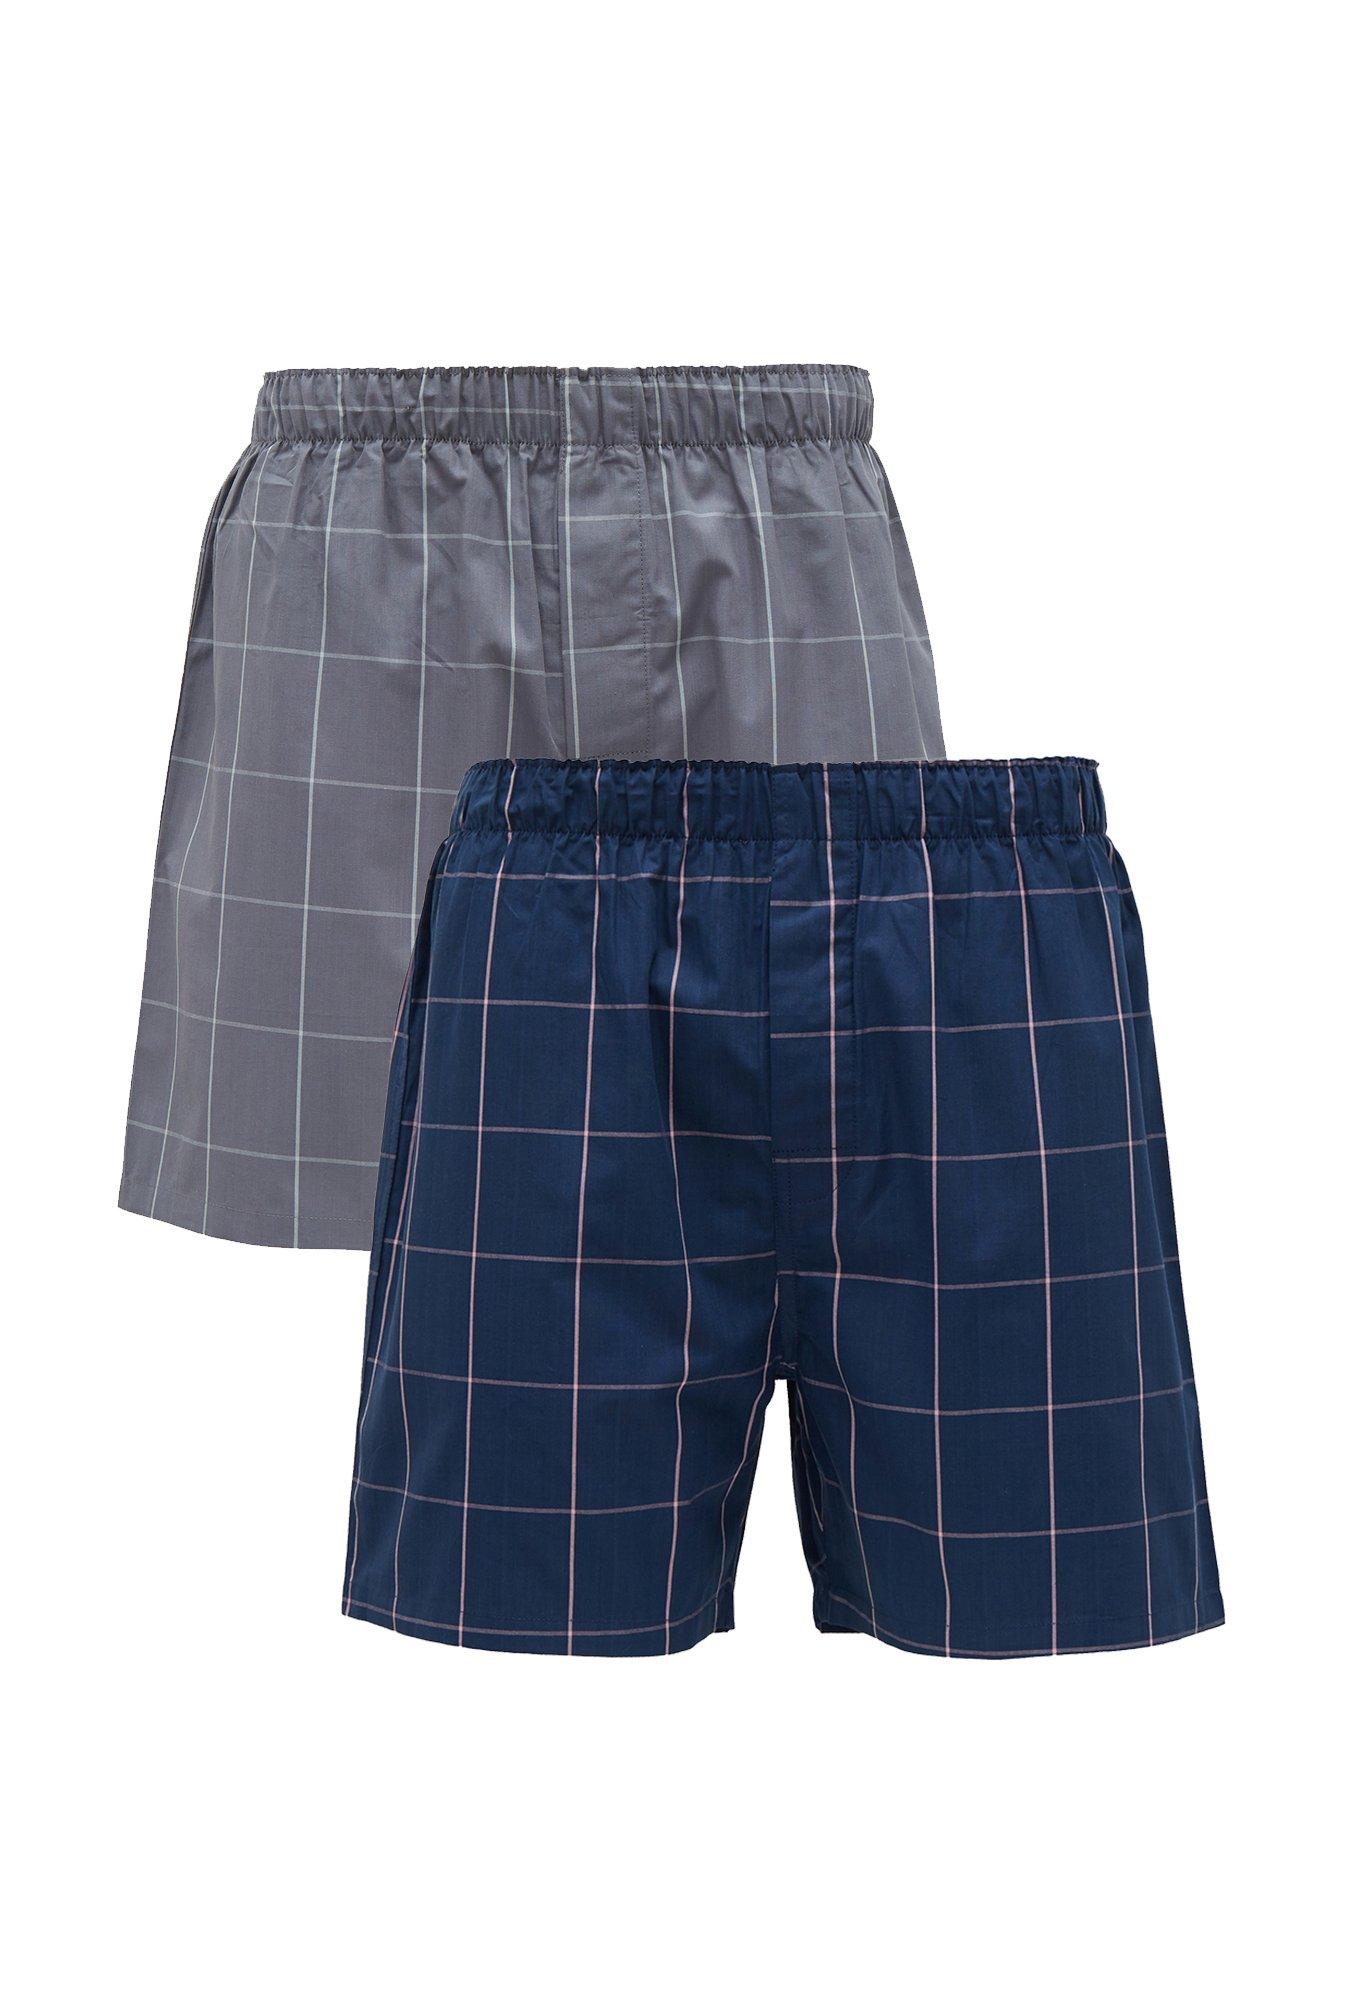 XYXX Grey & Navy Checks Boxers (Pack Of 2)